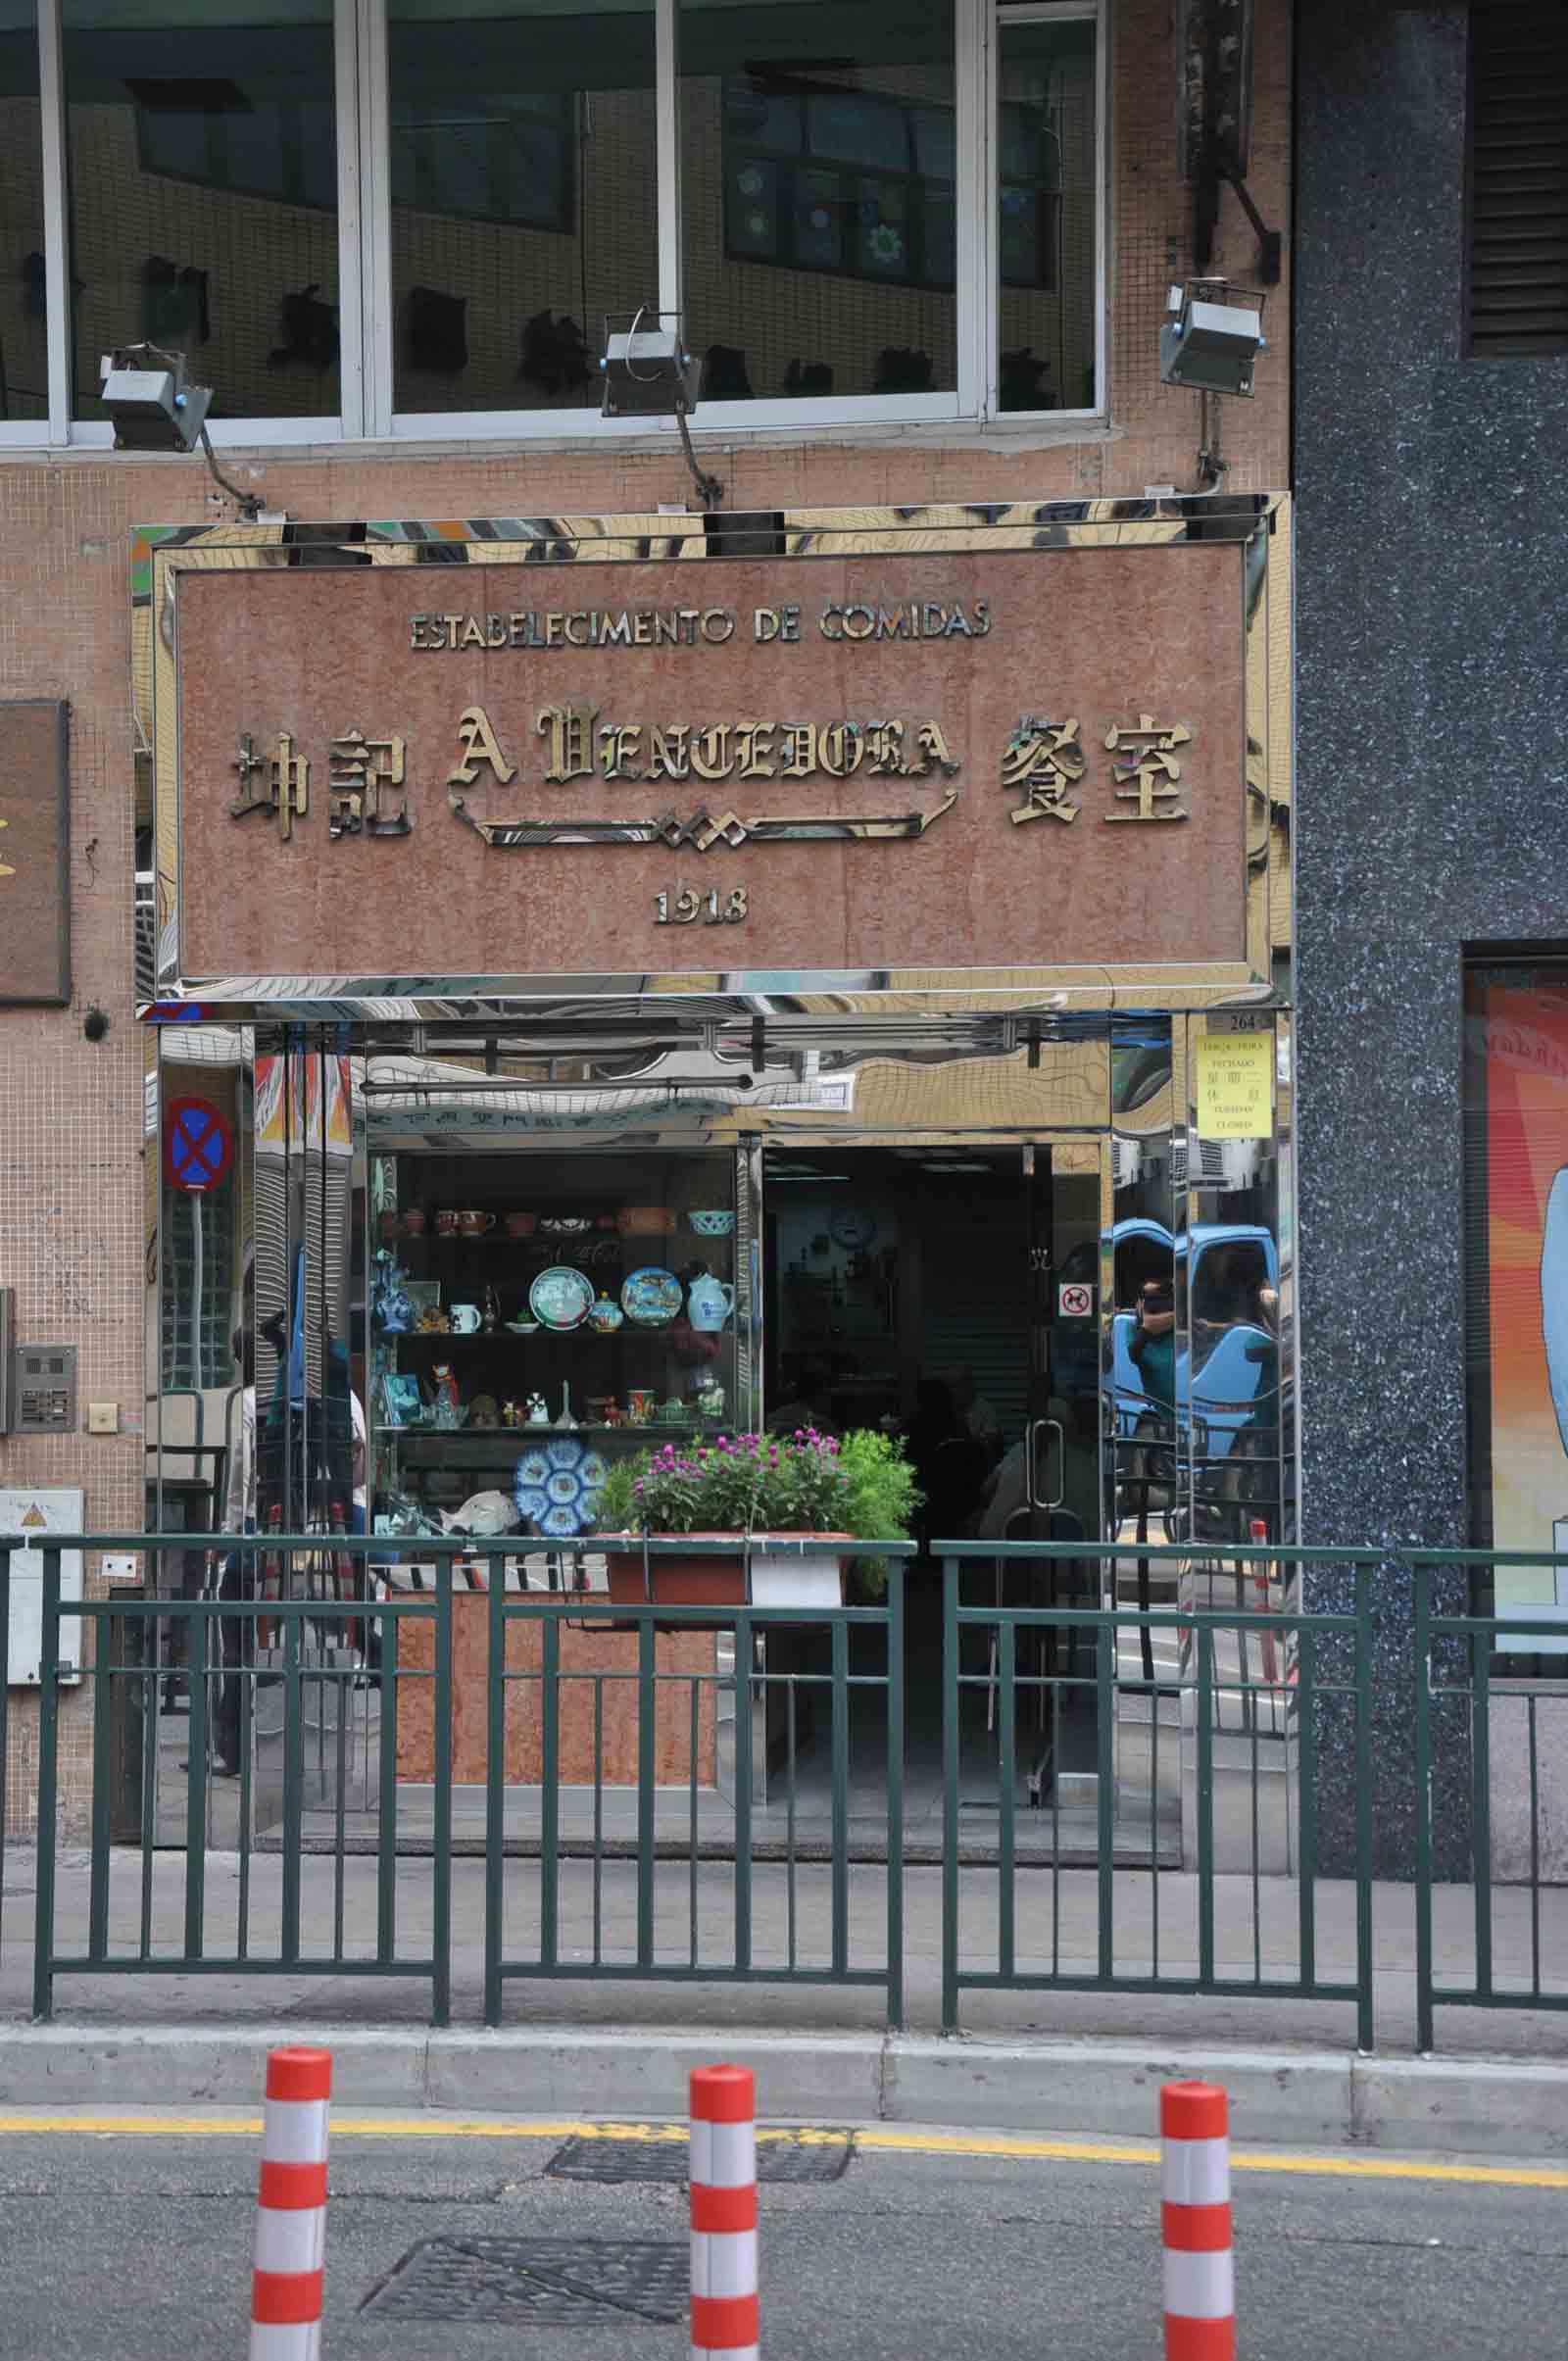 A Vencedora Macau entrance